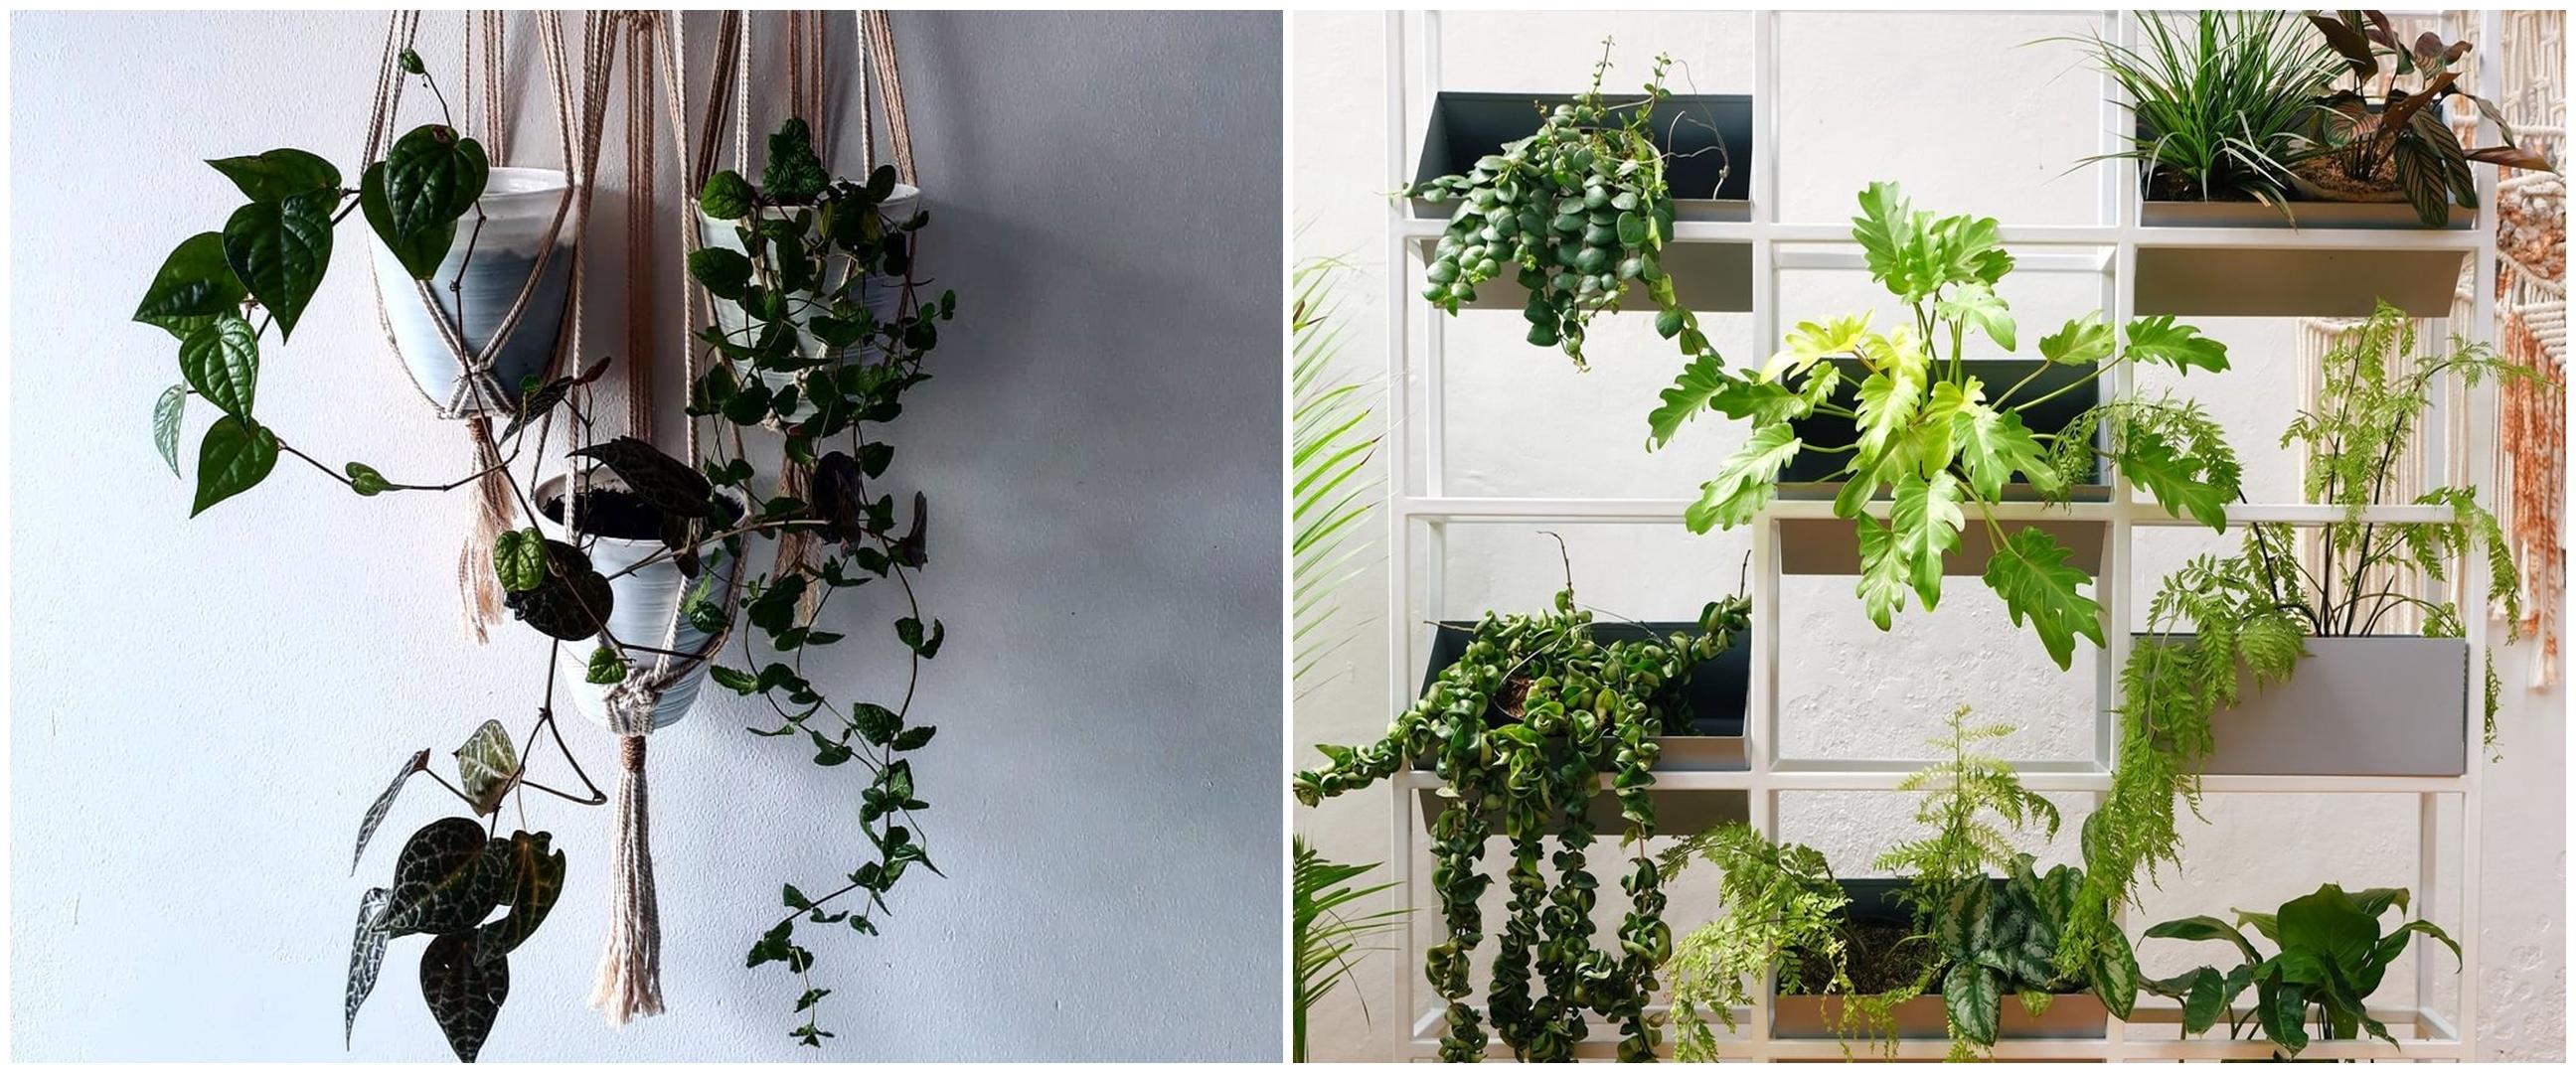 5 Cara menata tanaman hias gantung untuk perindah rumah